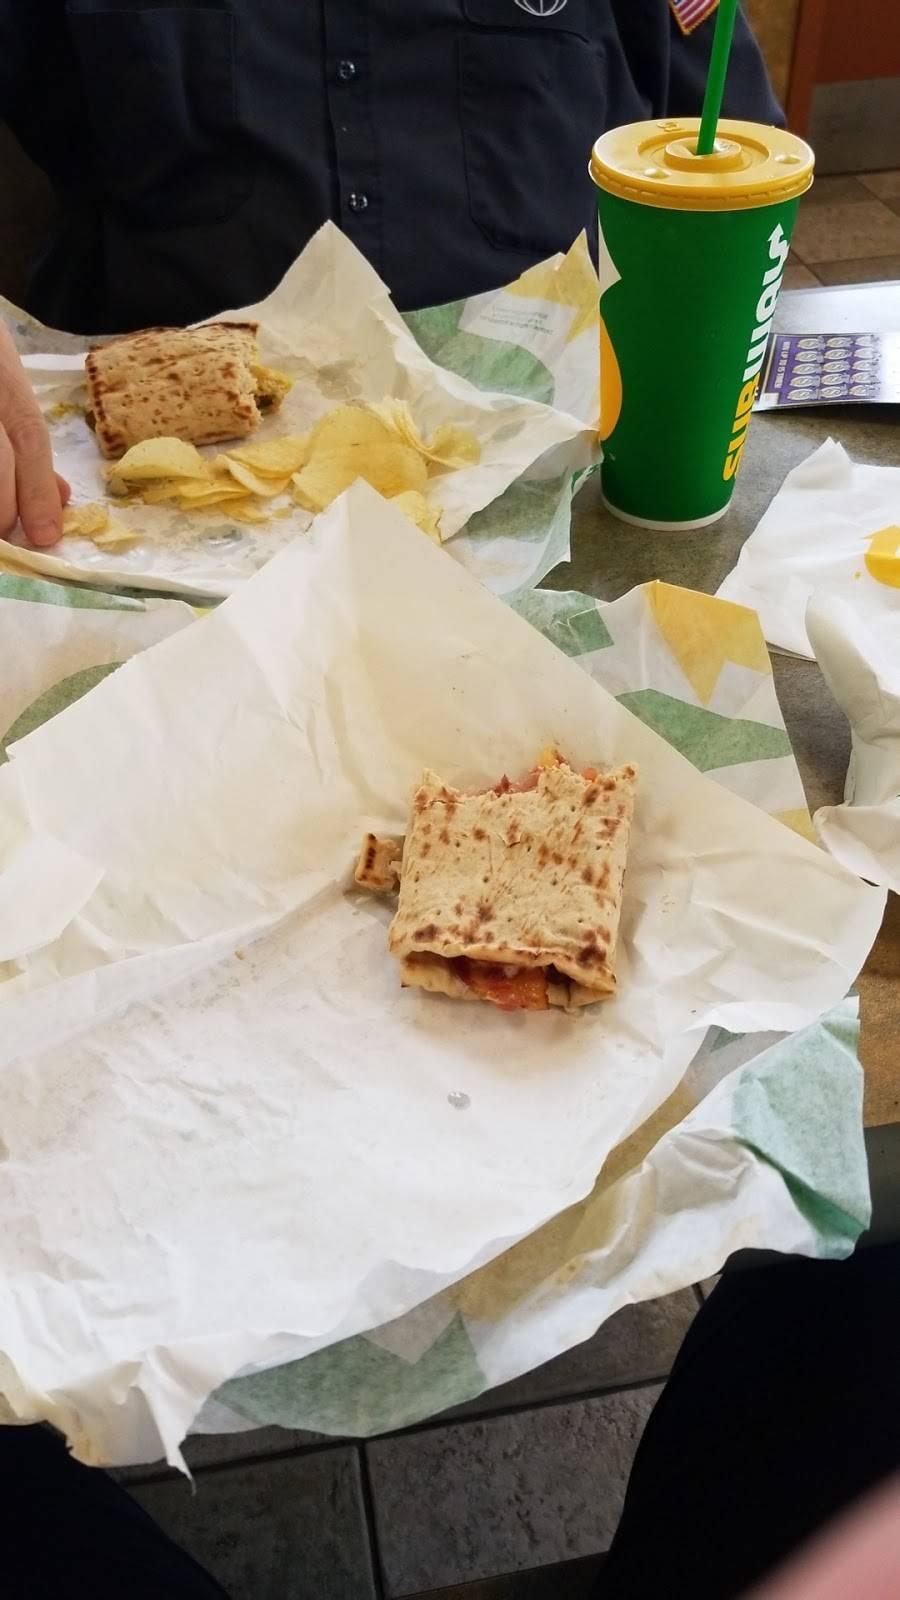 Subway | meal takeaway | 1907 W Old Spanish Trail, New Iberia, LA 70560, USA | 3375601323 OR +1 337-560-1323